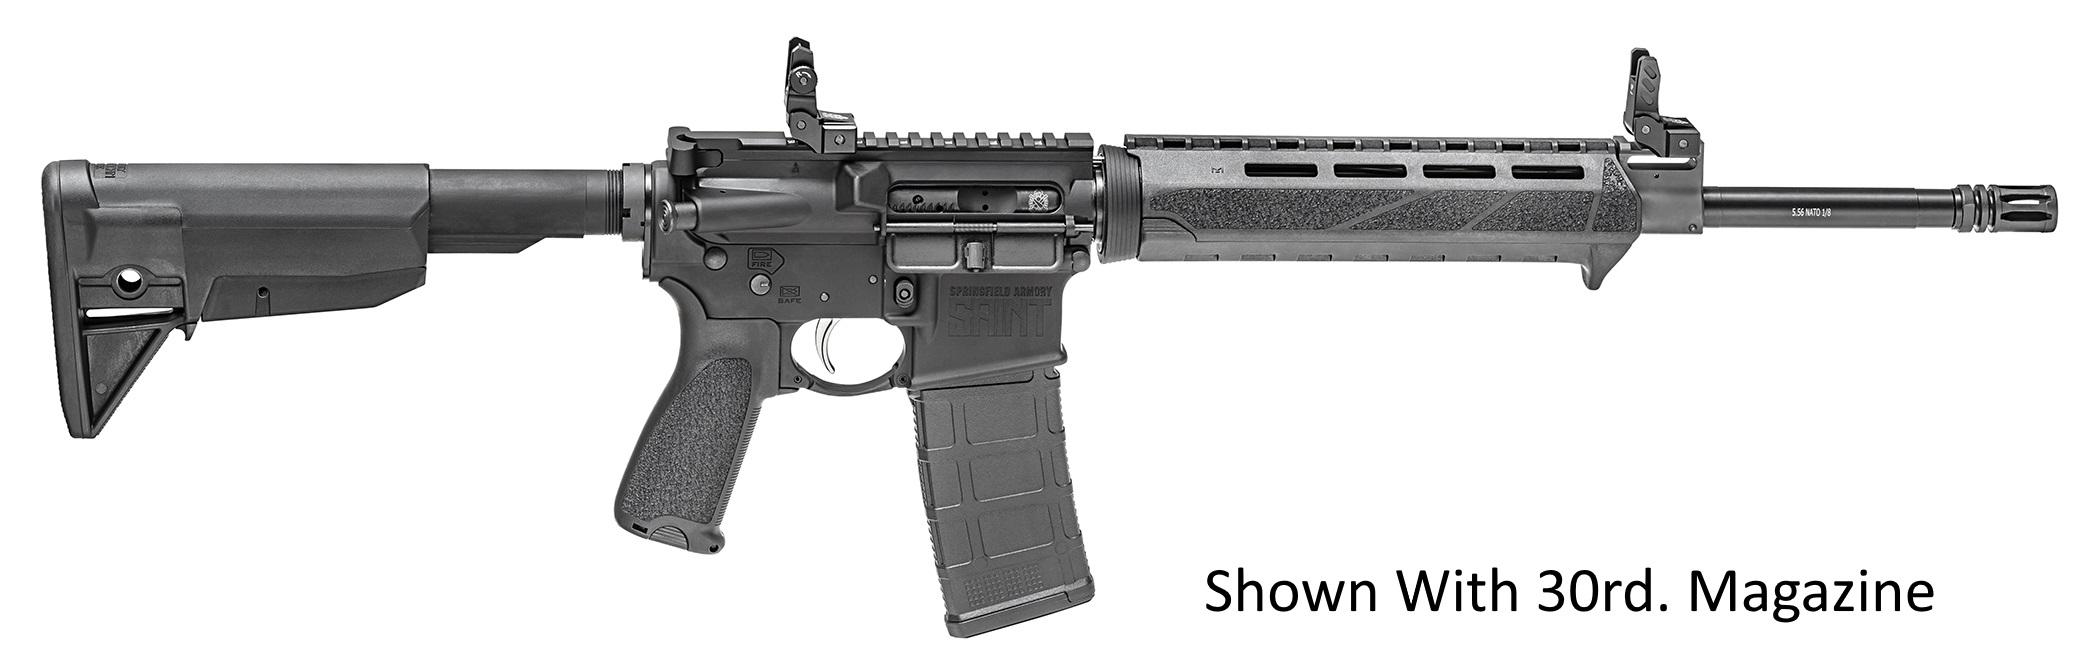 Springfield Armory Saint 223 Rem | 5.56 NATO